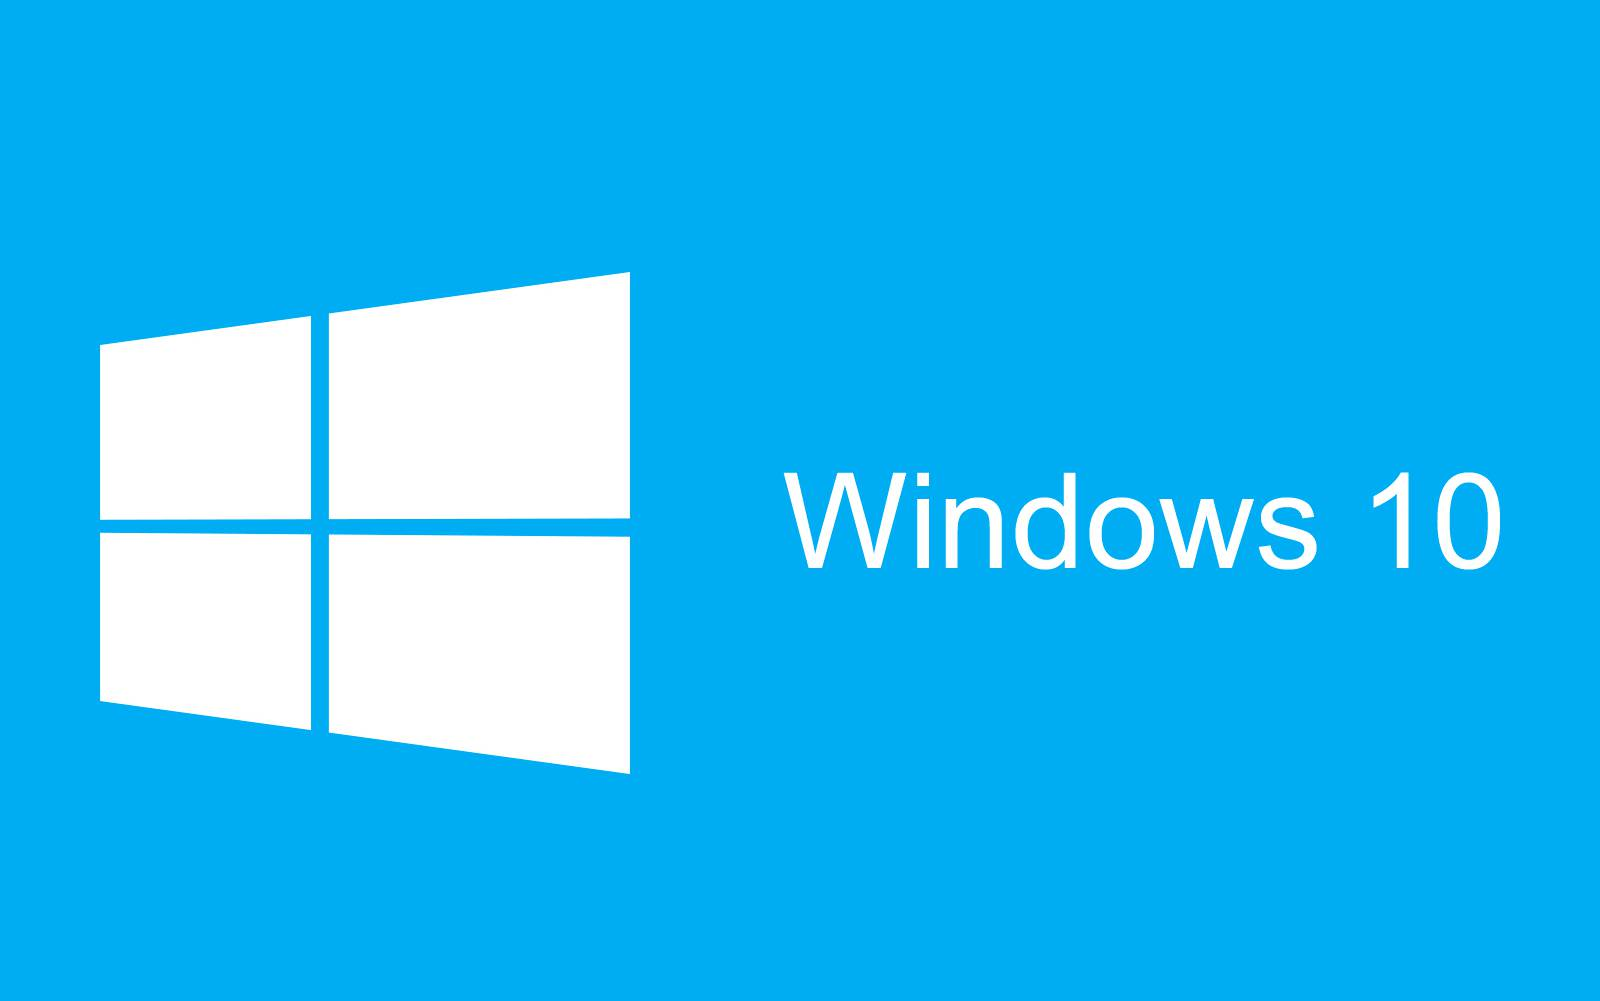 Windows 10 Microsoft Veste GROZAVA Utilizatori